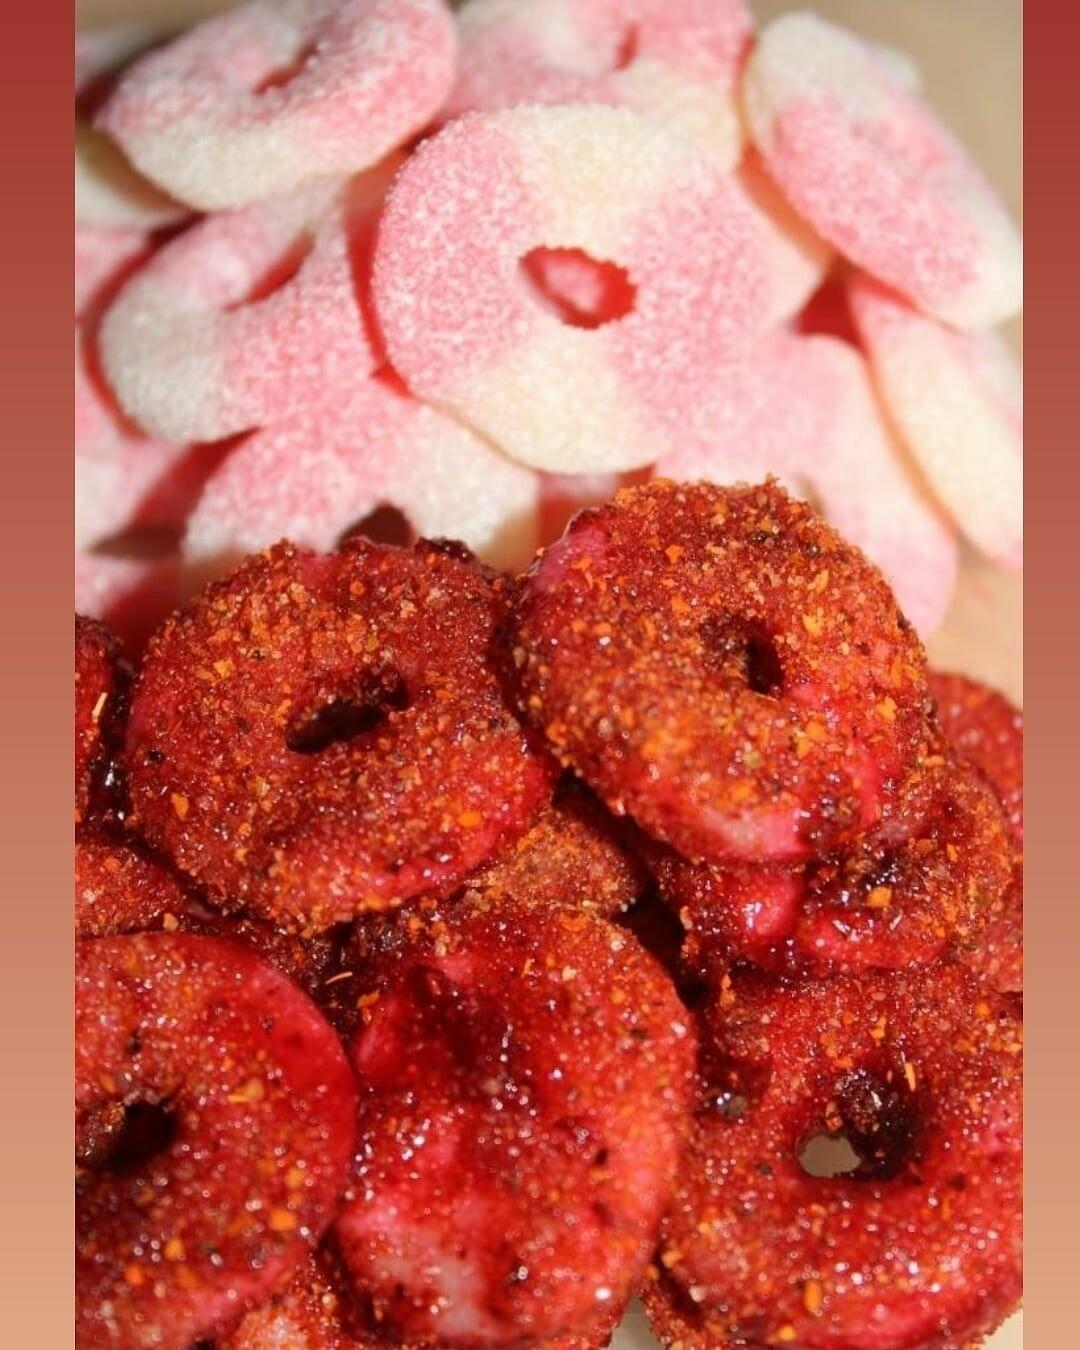 Cheklada Pink Lemonade Rings